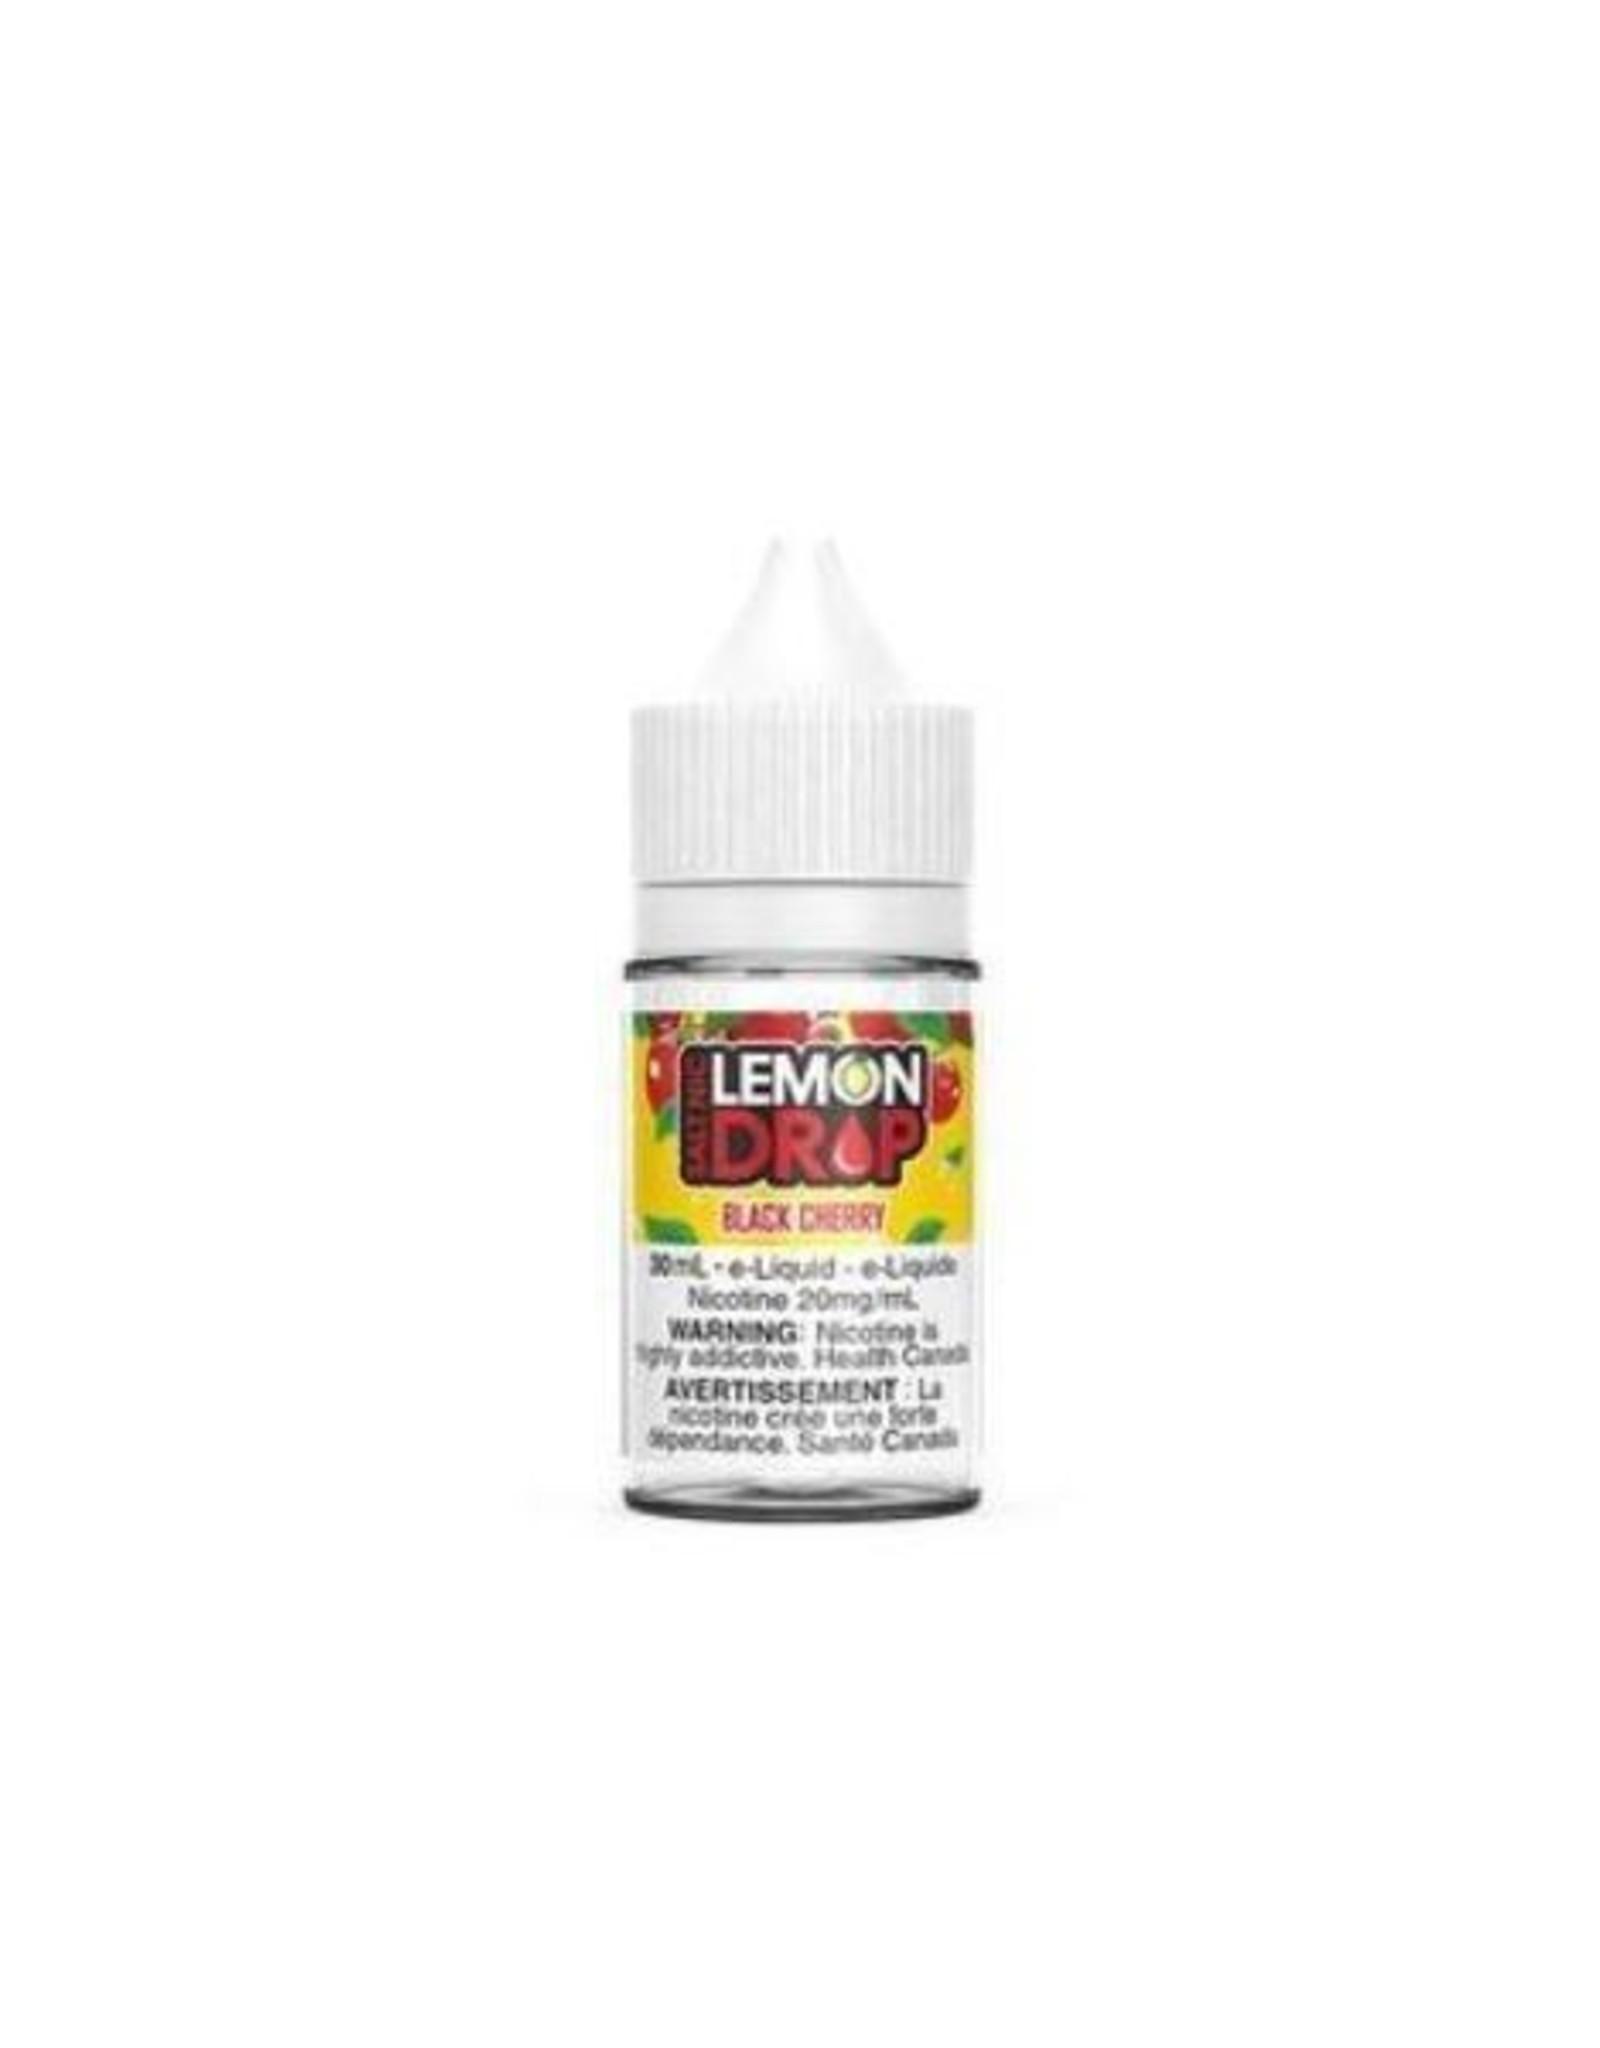 lLEMON DROP Black Cherry Salt By Lemon Drop 20mg